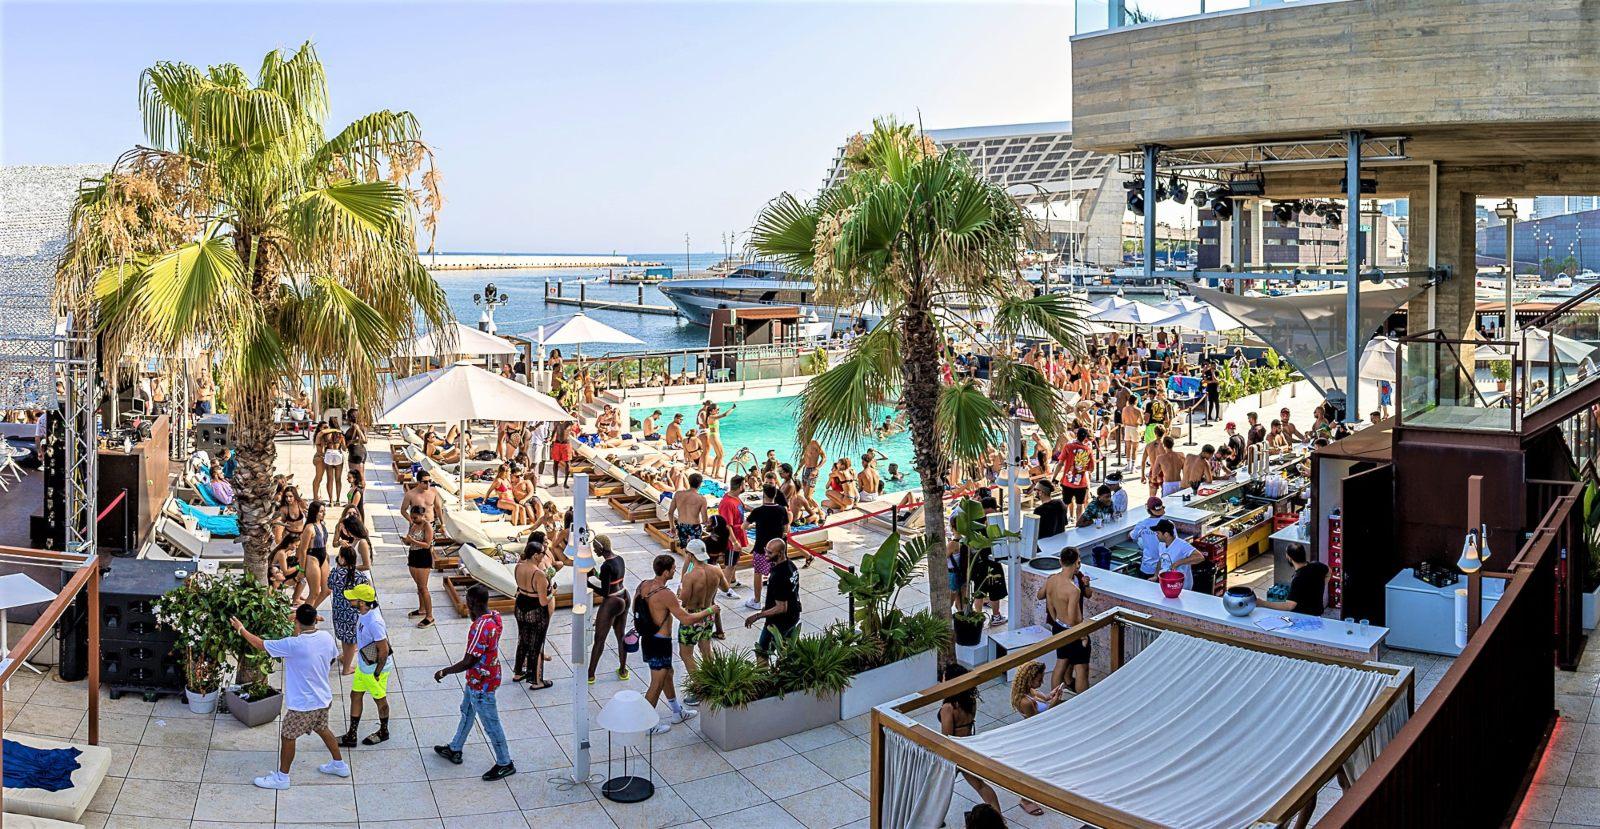 Go Beach Club Barcelona Pool Go Beach Club Barcelona Pool Carrer Port Esportiu, 14P, 08930 Barcelona, España